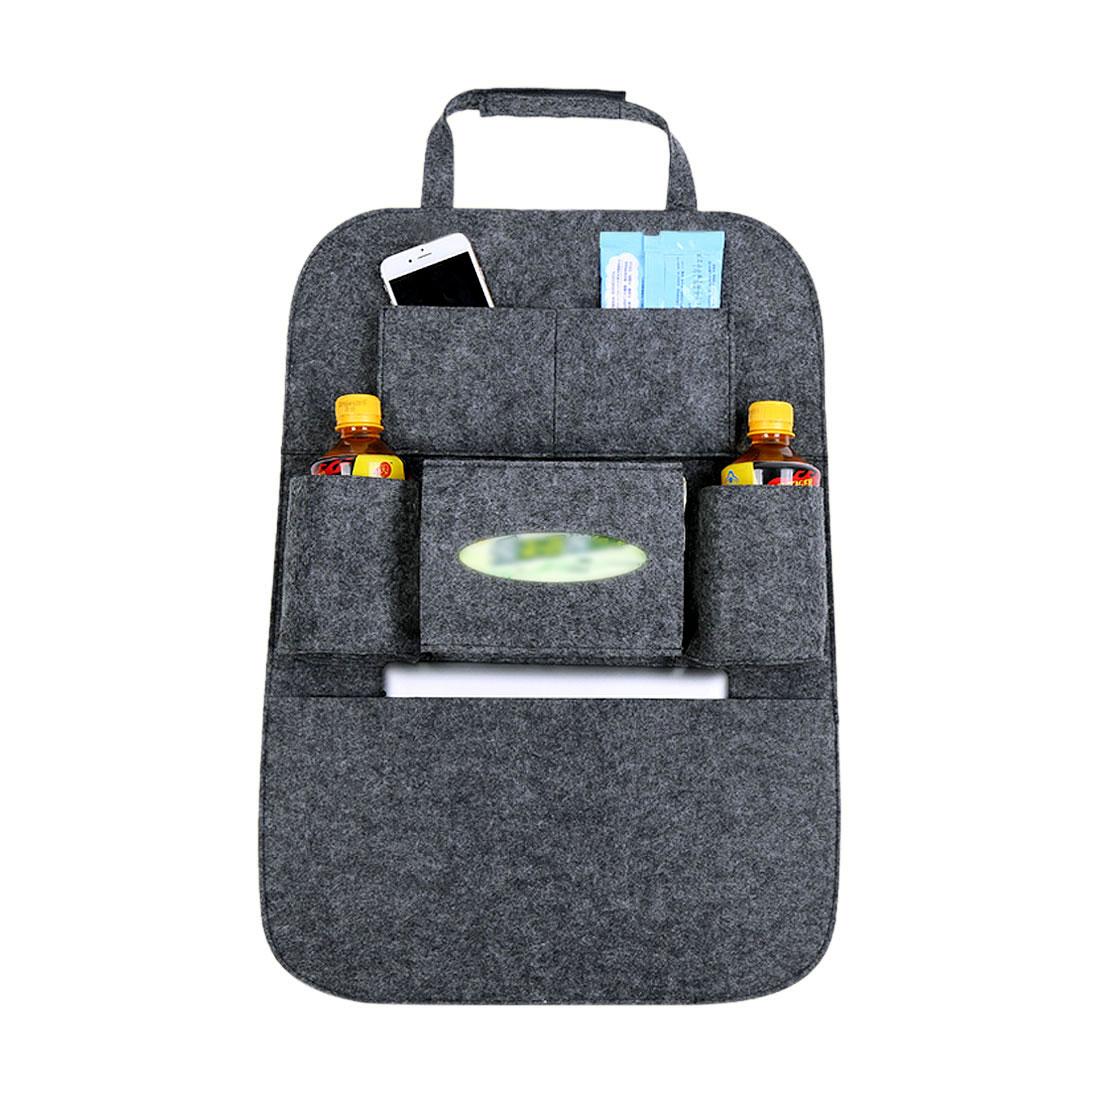 Deep Gray Multi-Pocket Storage Bag Car Vehicle Seat Back Hanger Holder Organizer